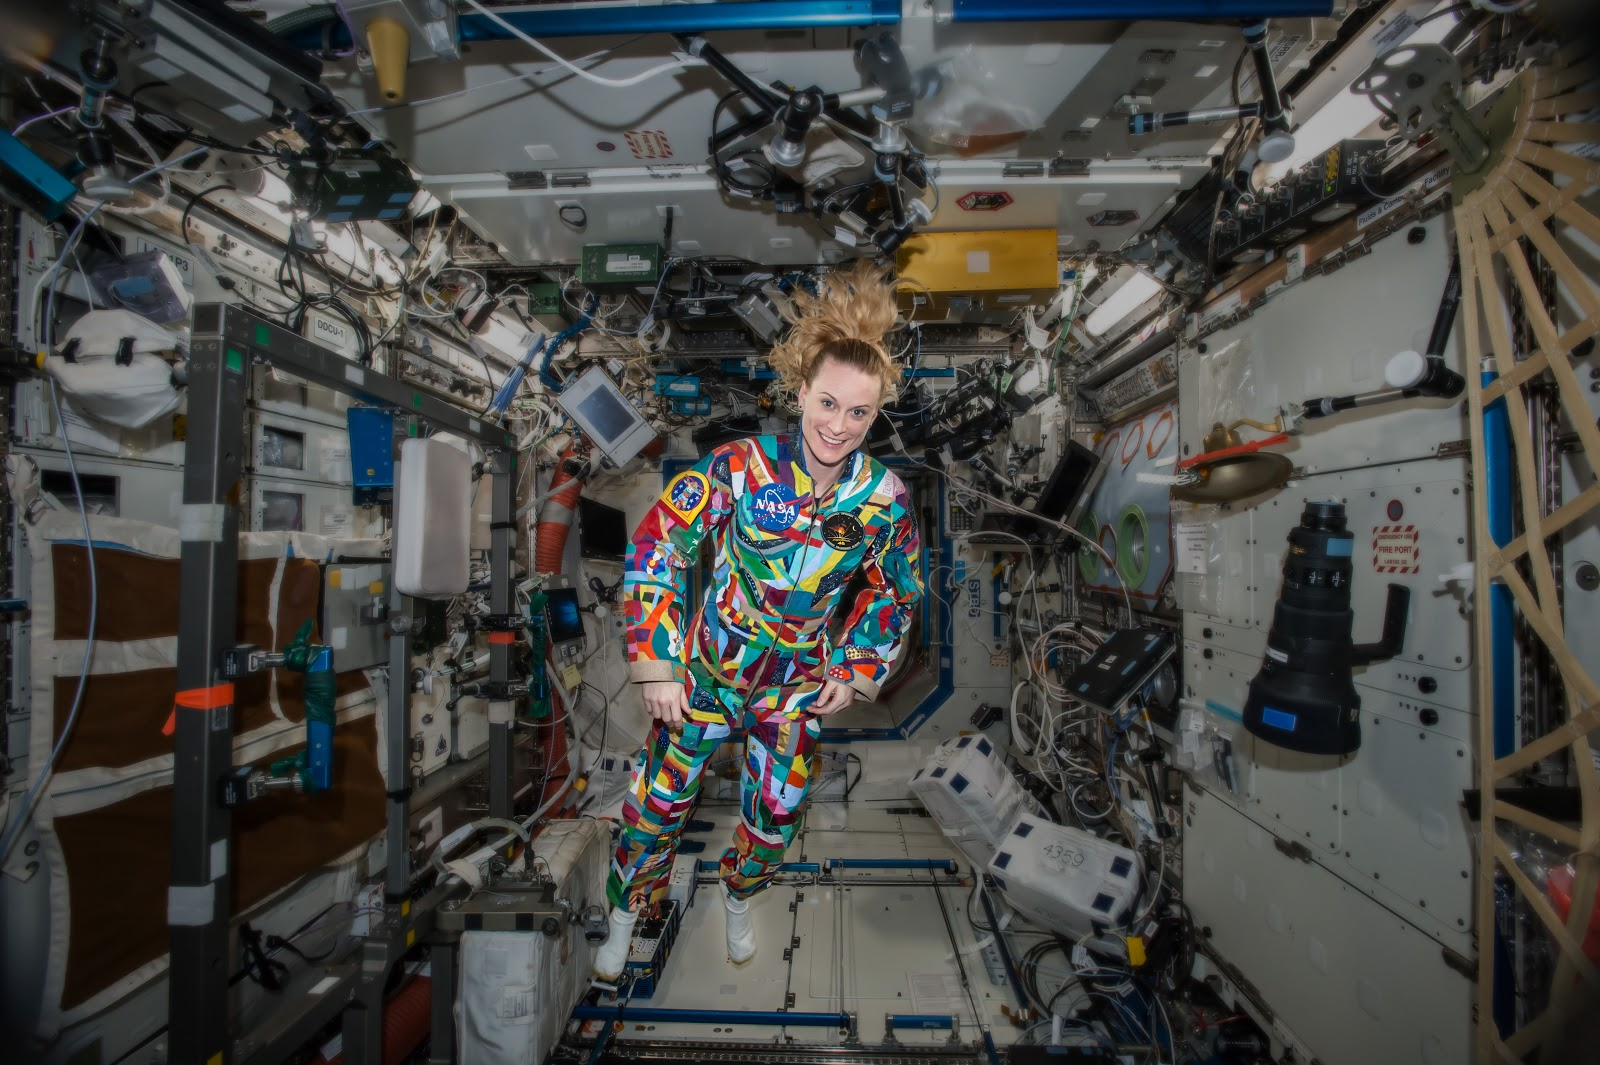 astronaut in maryland - photo #20